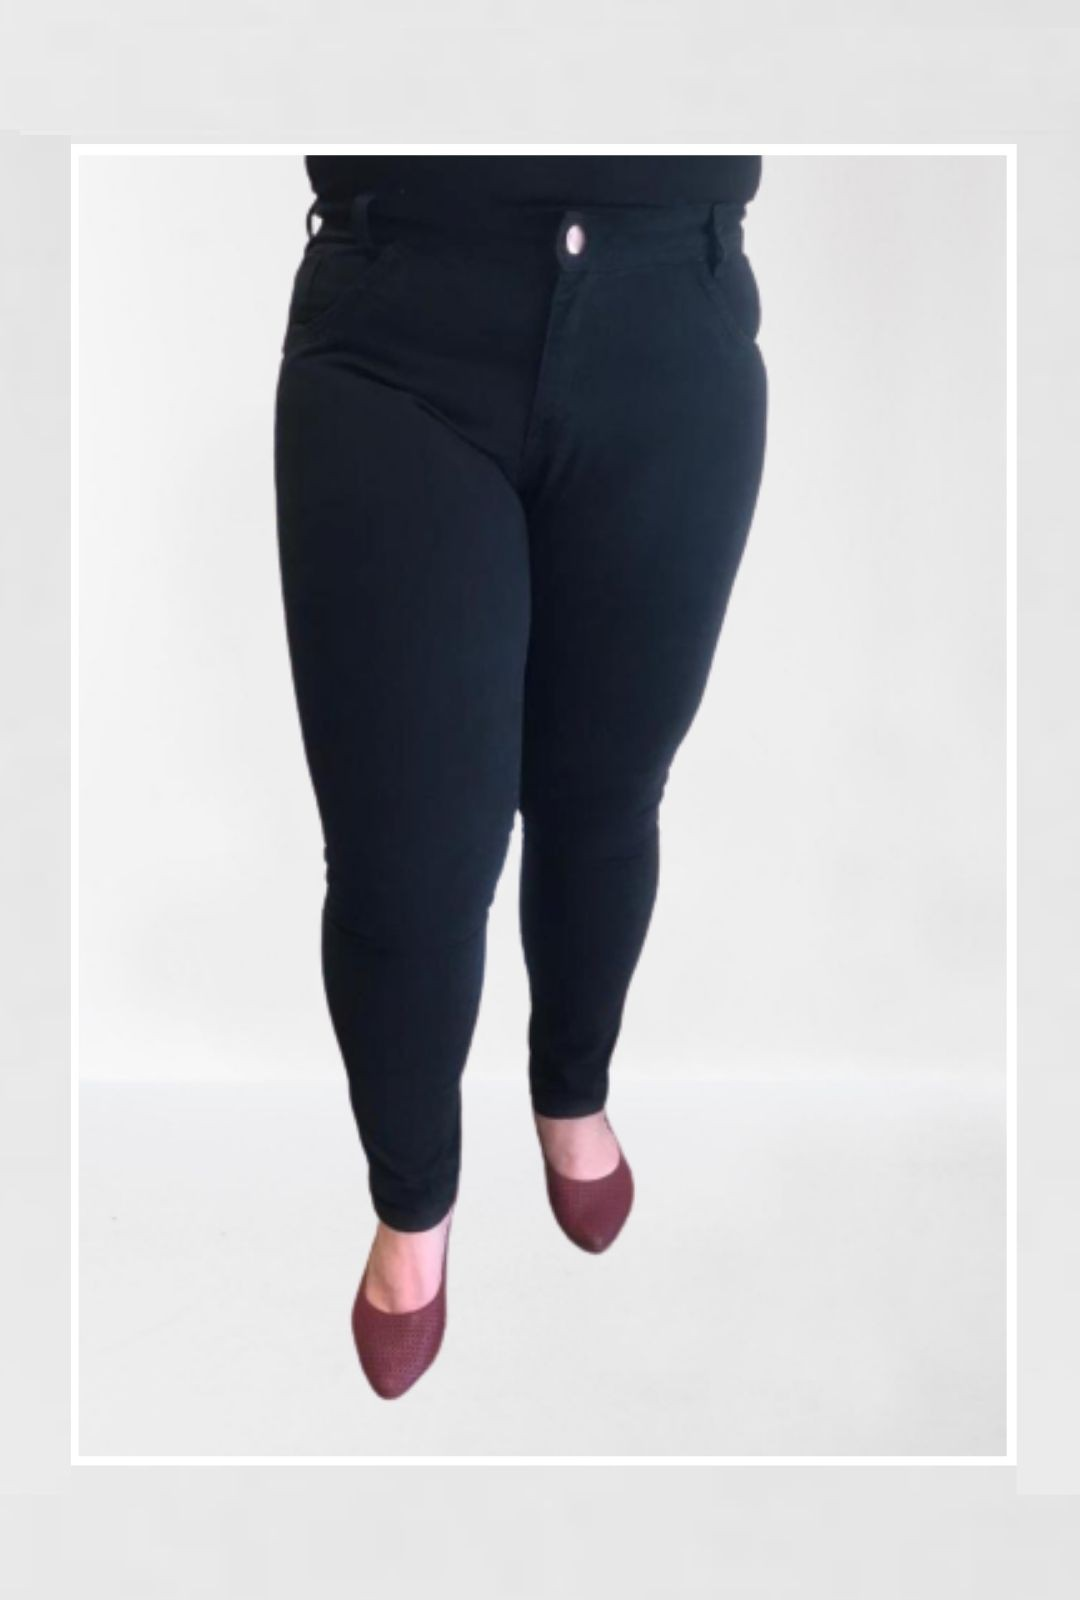 Calça Jeans Plus Size Preta  - ModaStore   Moda Feminina